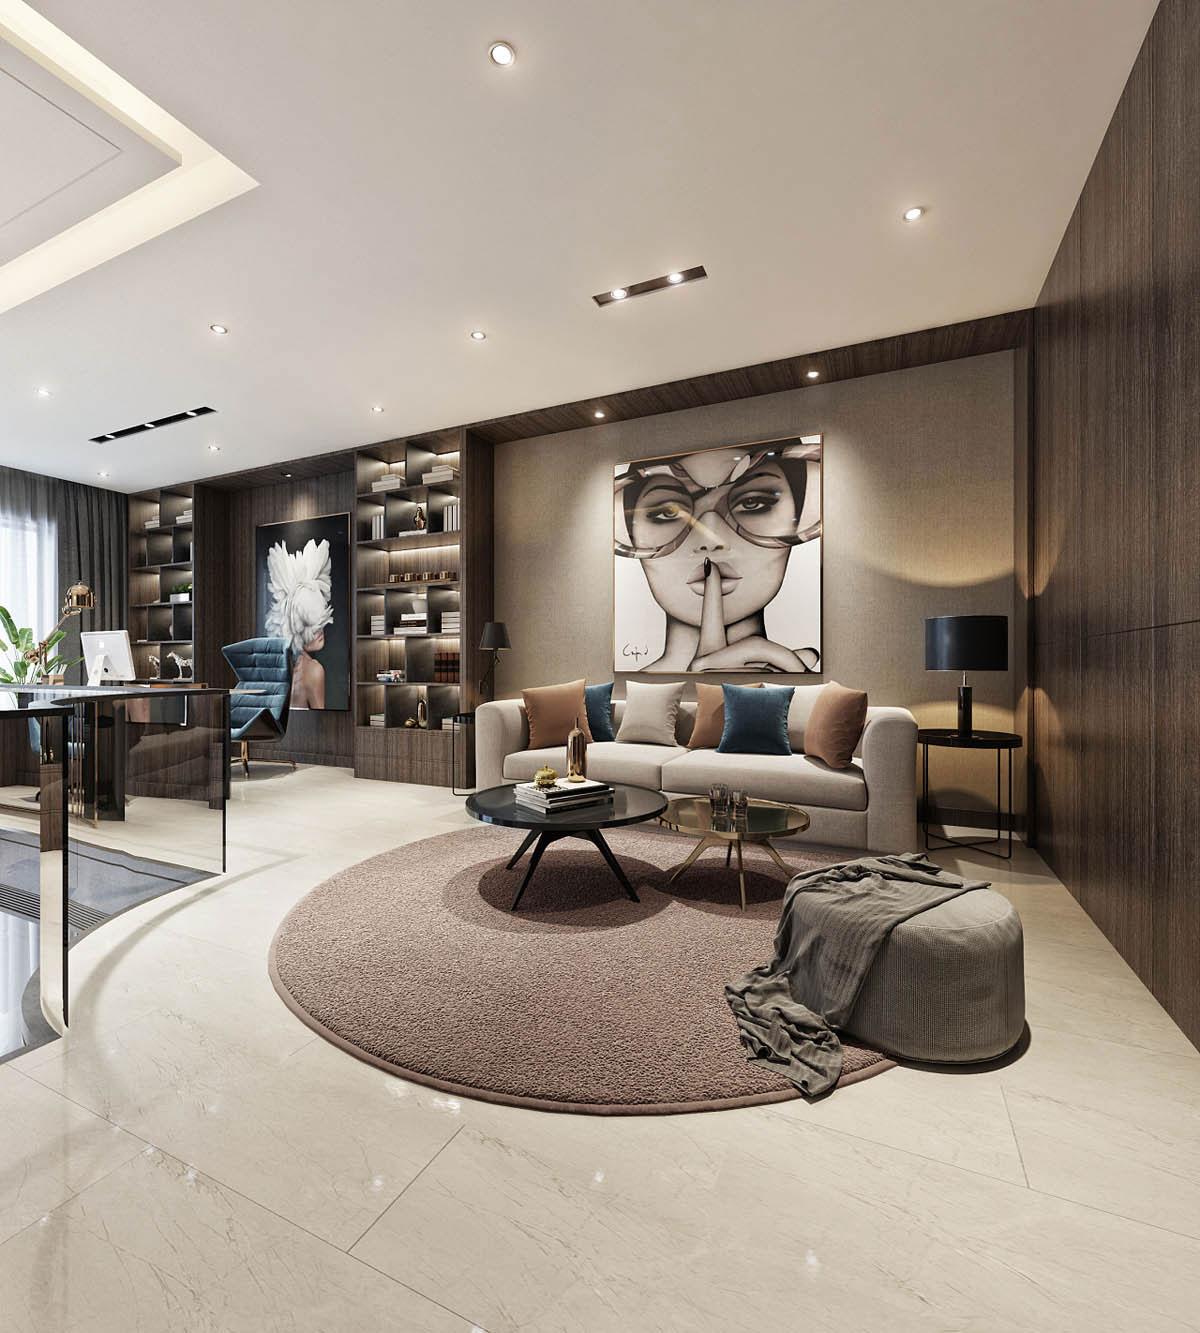 New Home Designs Latest Luxury Homes Interior Decoration: 2 نمونه طراحی داخلی خانه های لاکچری و مدرن به سبک آسیایی